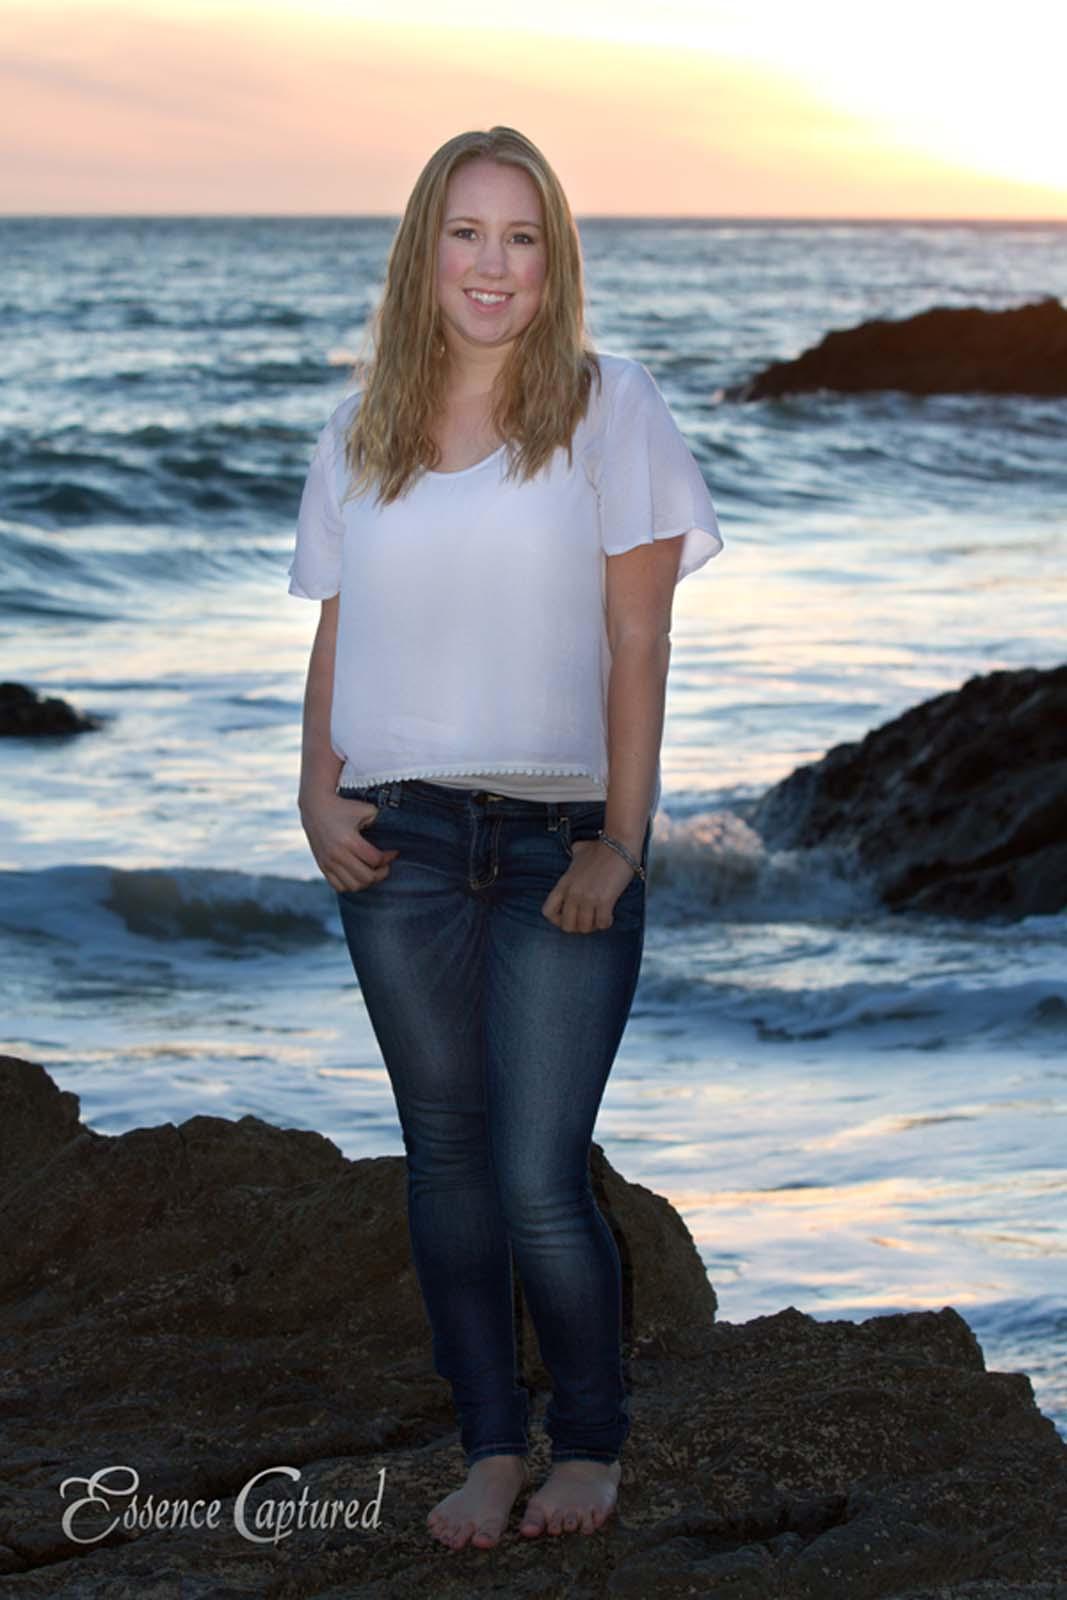 female high school senior portrait ocean backdrop white shirt blue jeans